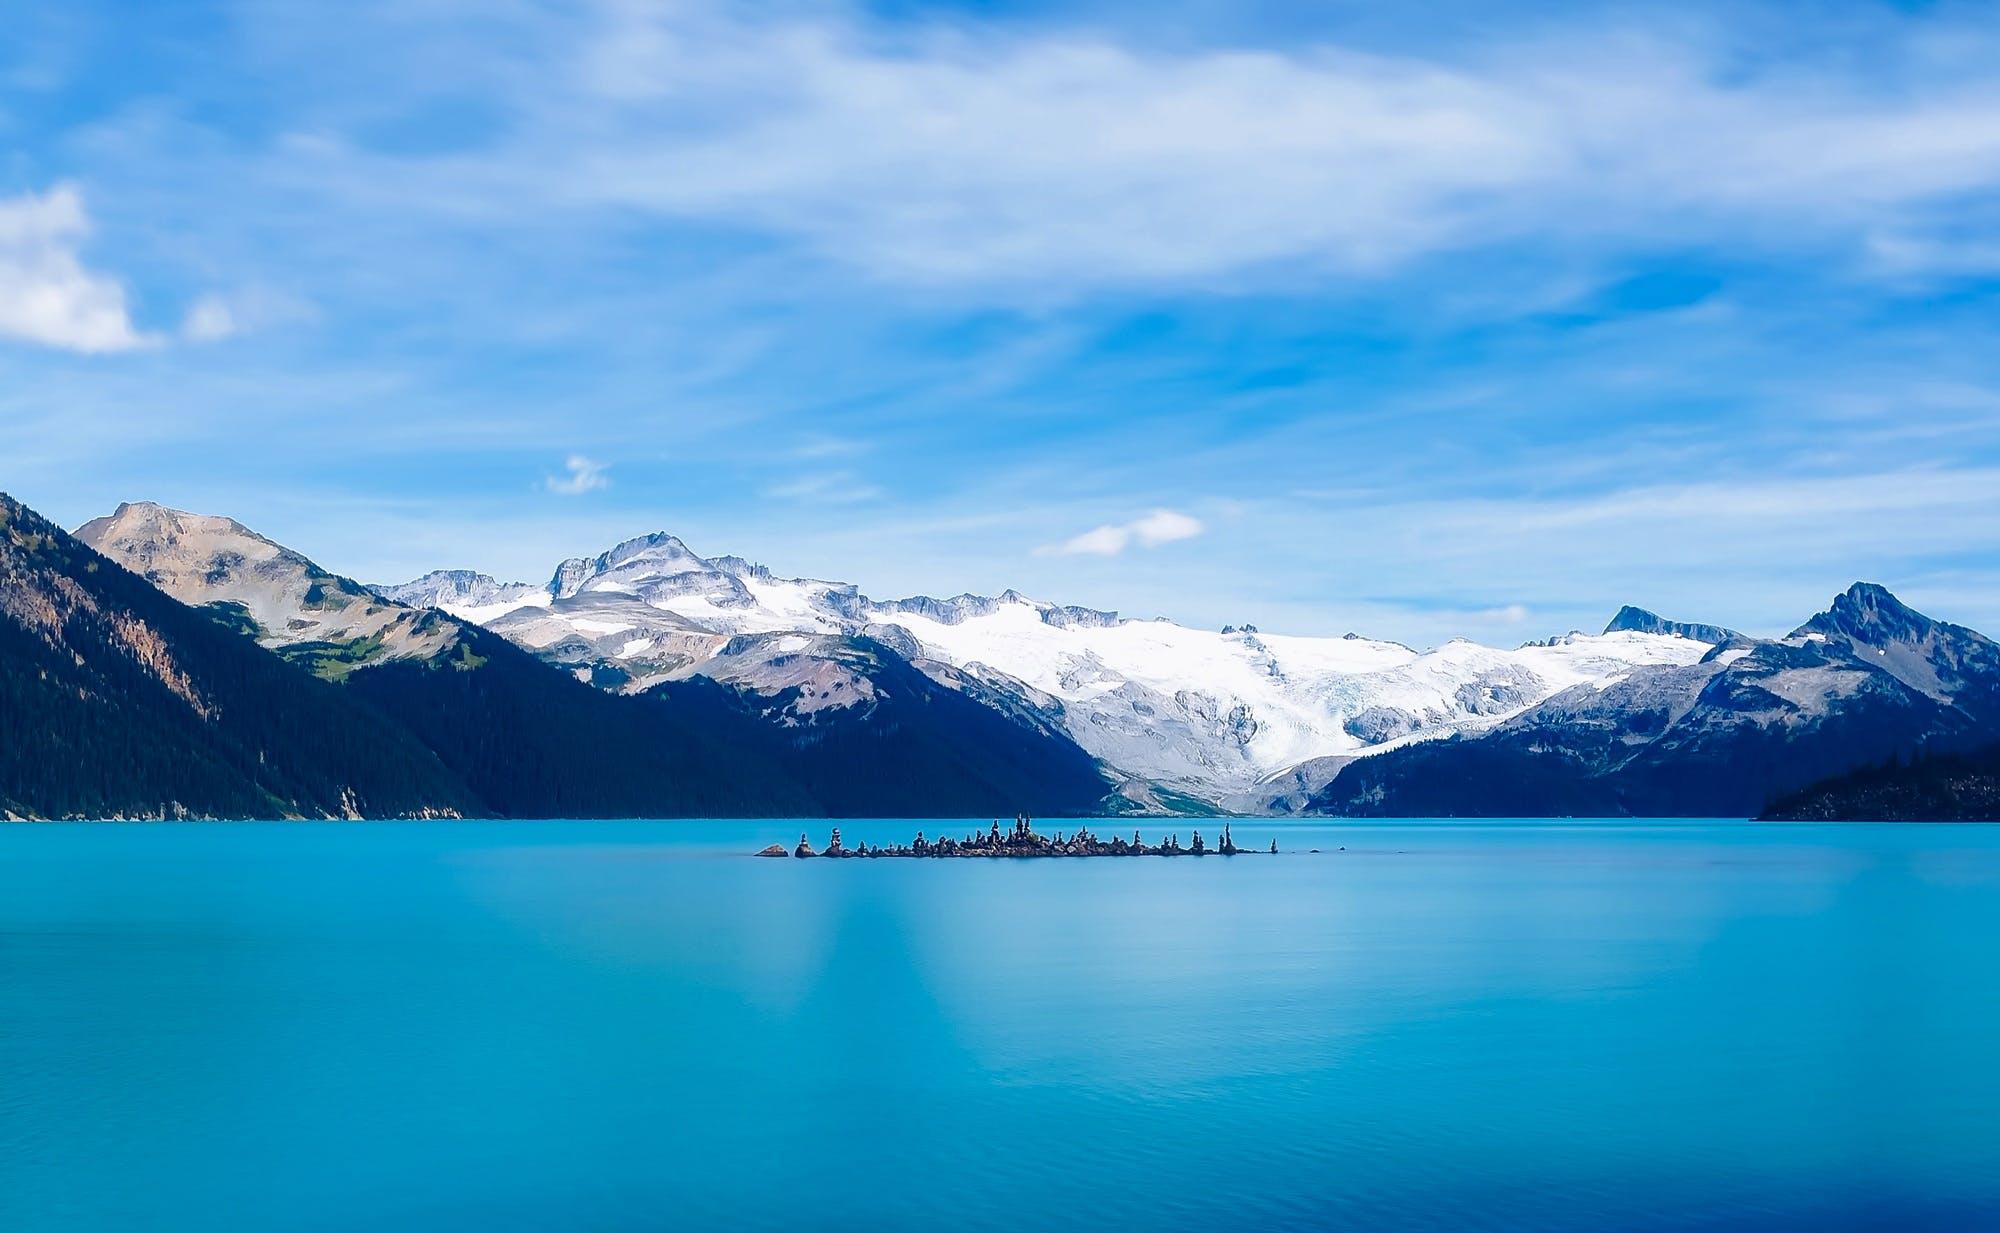 Scenic View of Frozen Lake Against Mountain Range